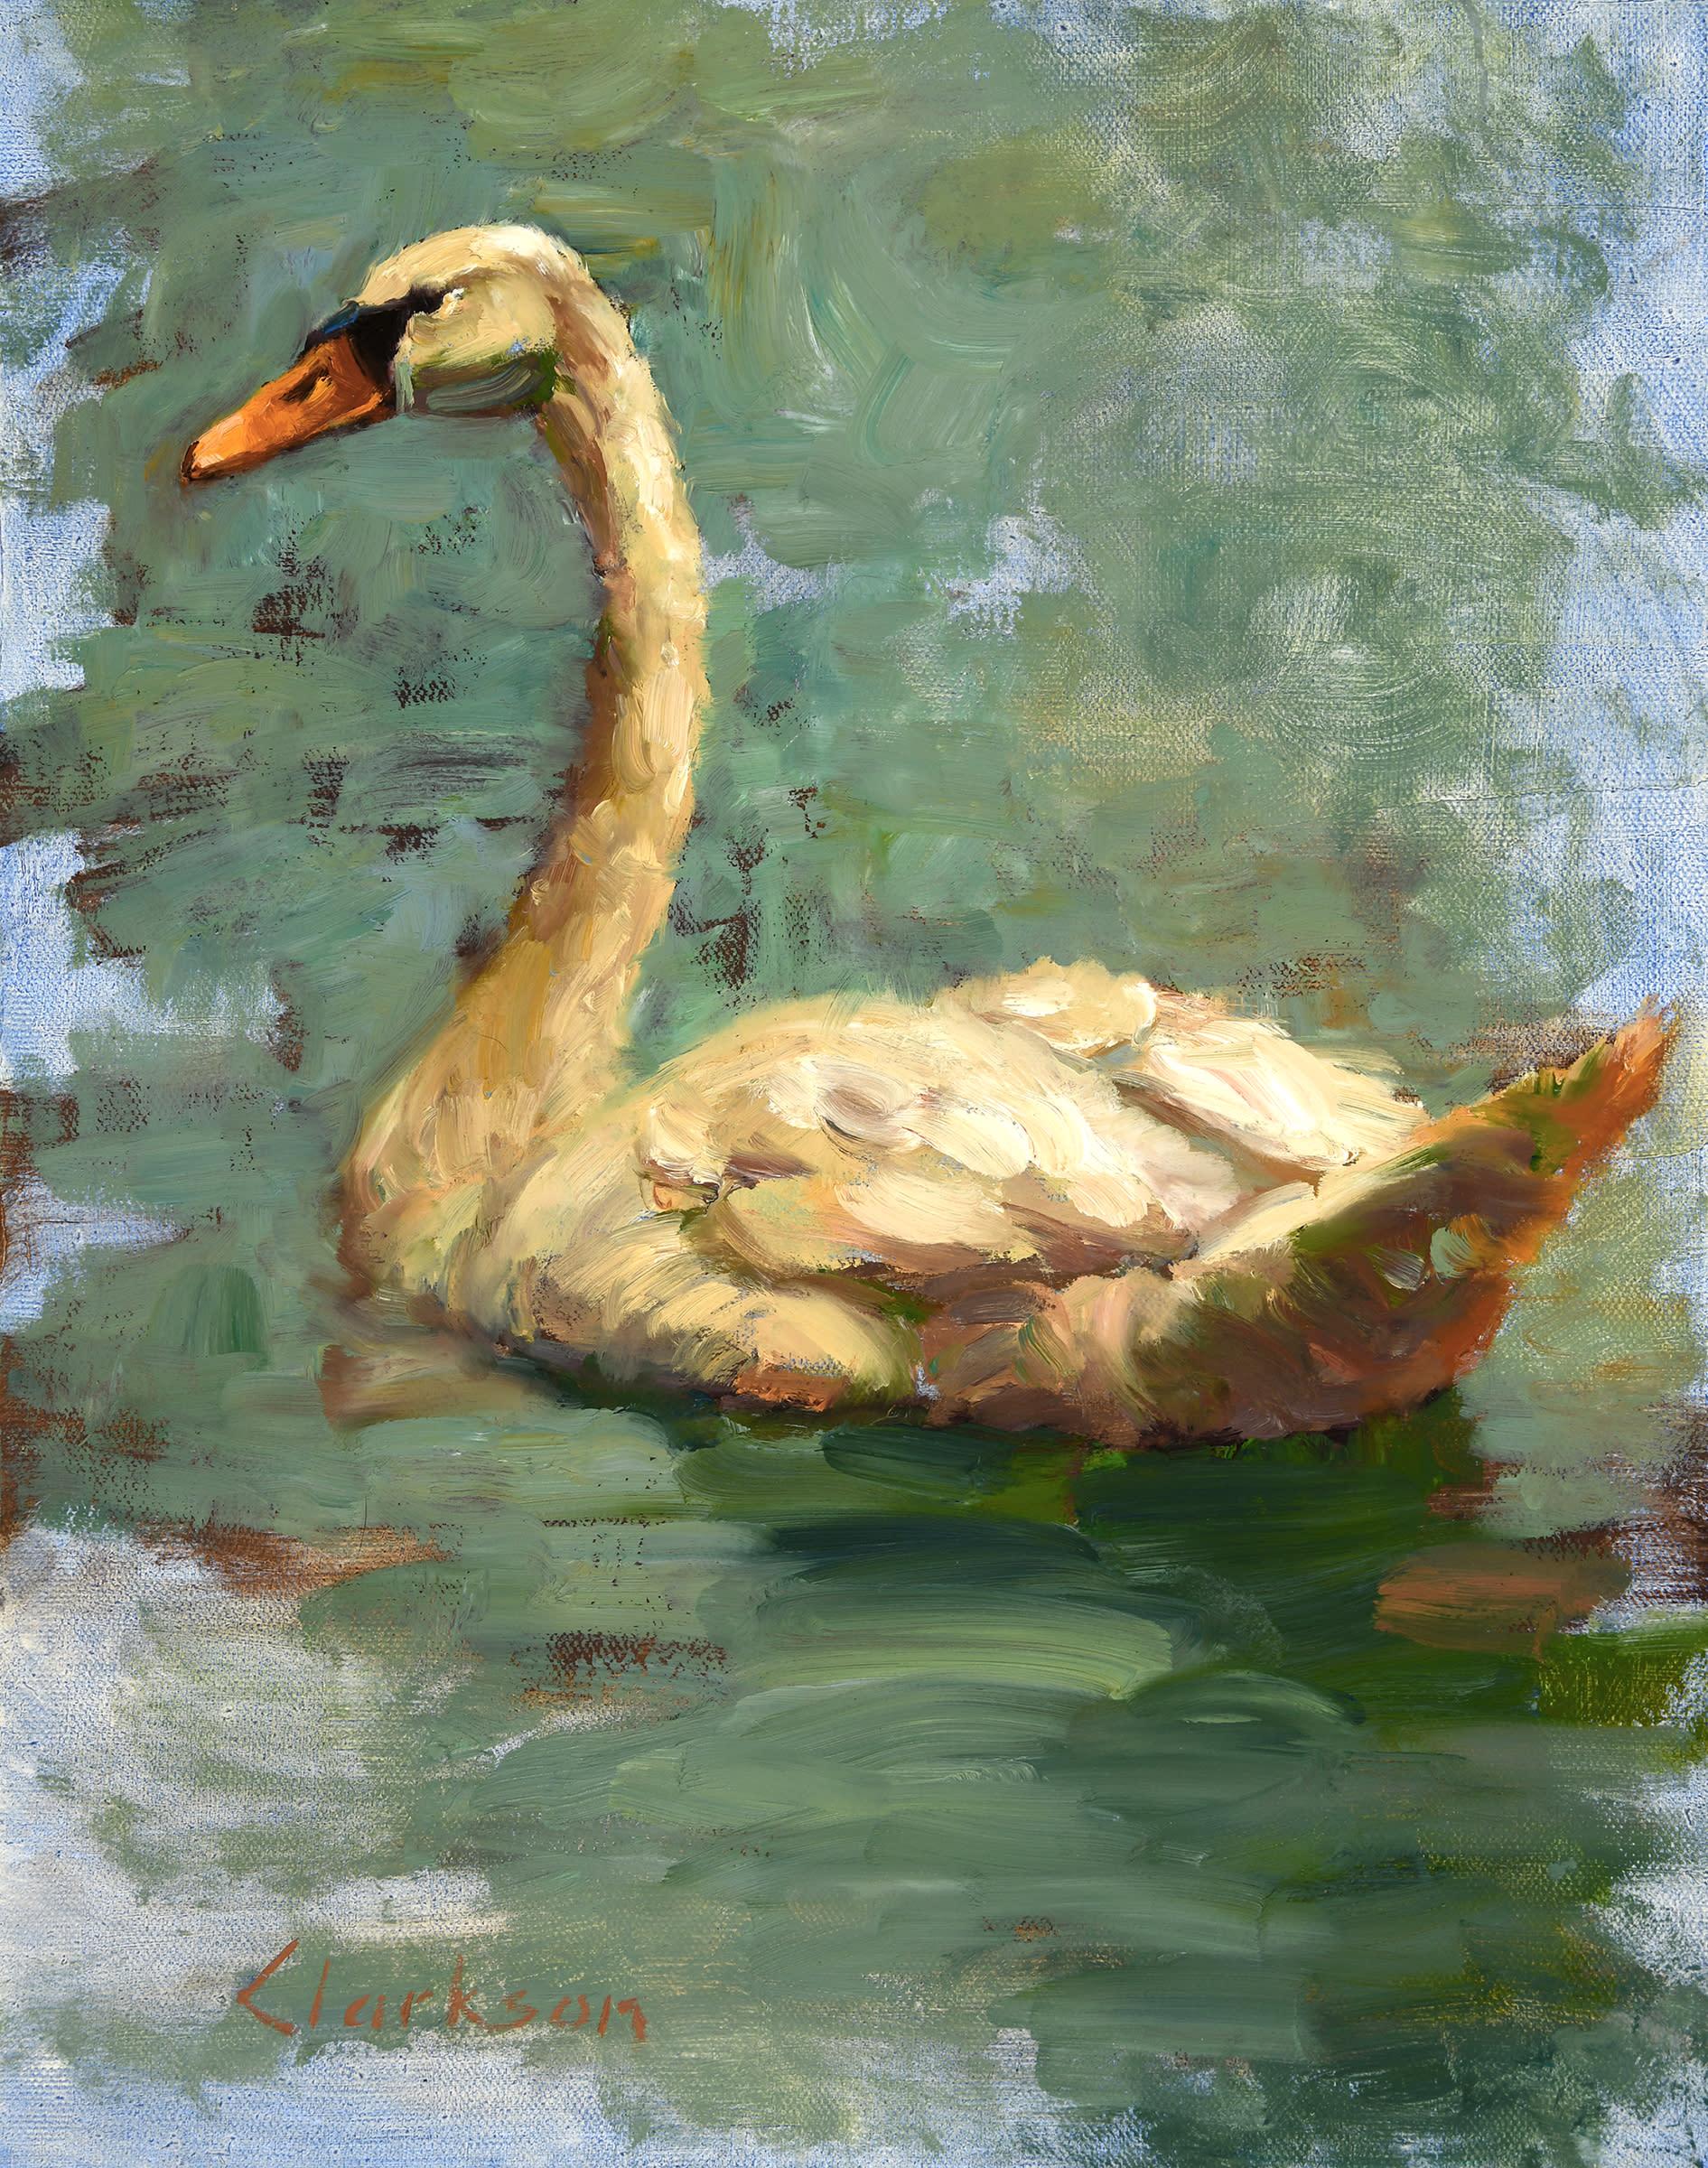 Mute swan 150 ppi for asf bi4t2u